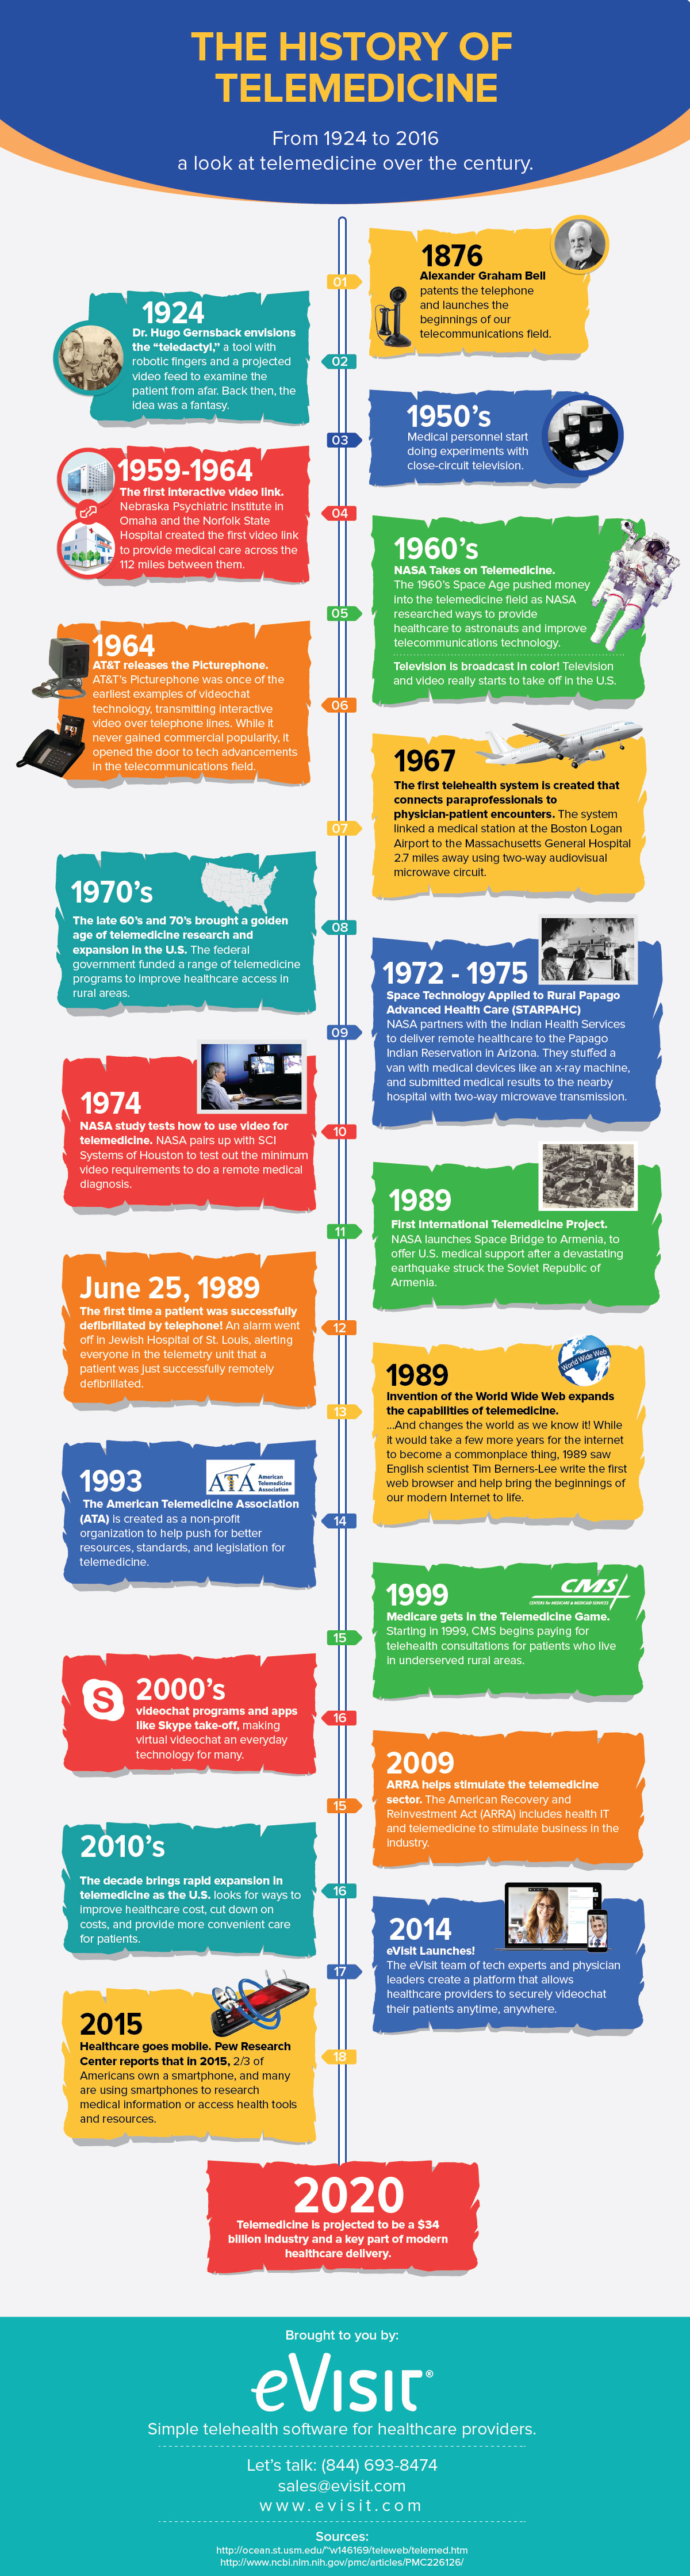 Infographic History of Telemedicine